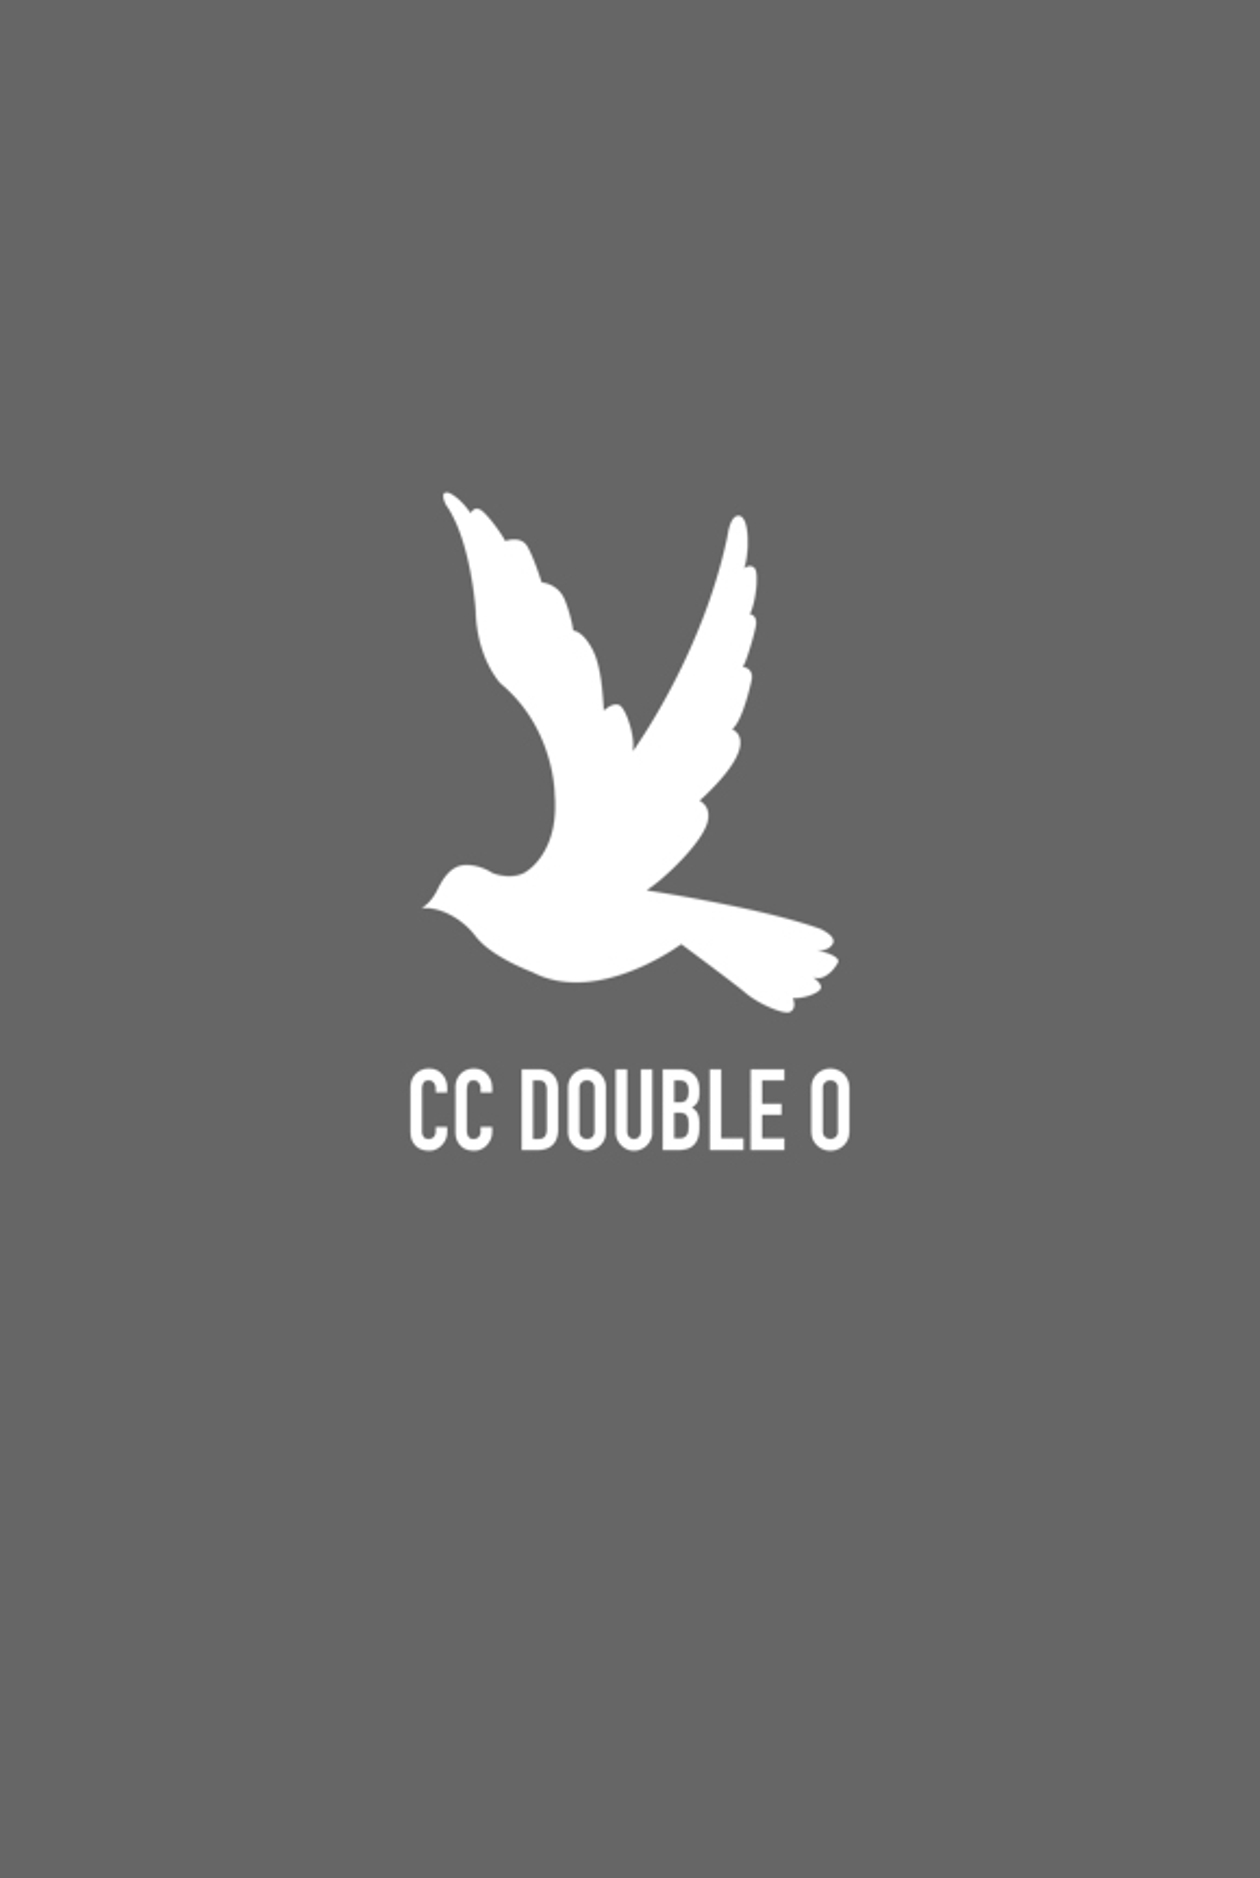 CC DOUBLE O Printed Flip Flops